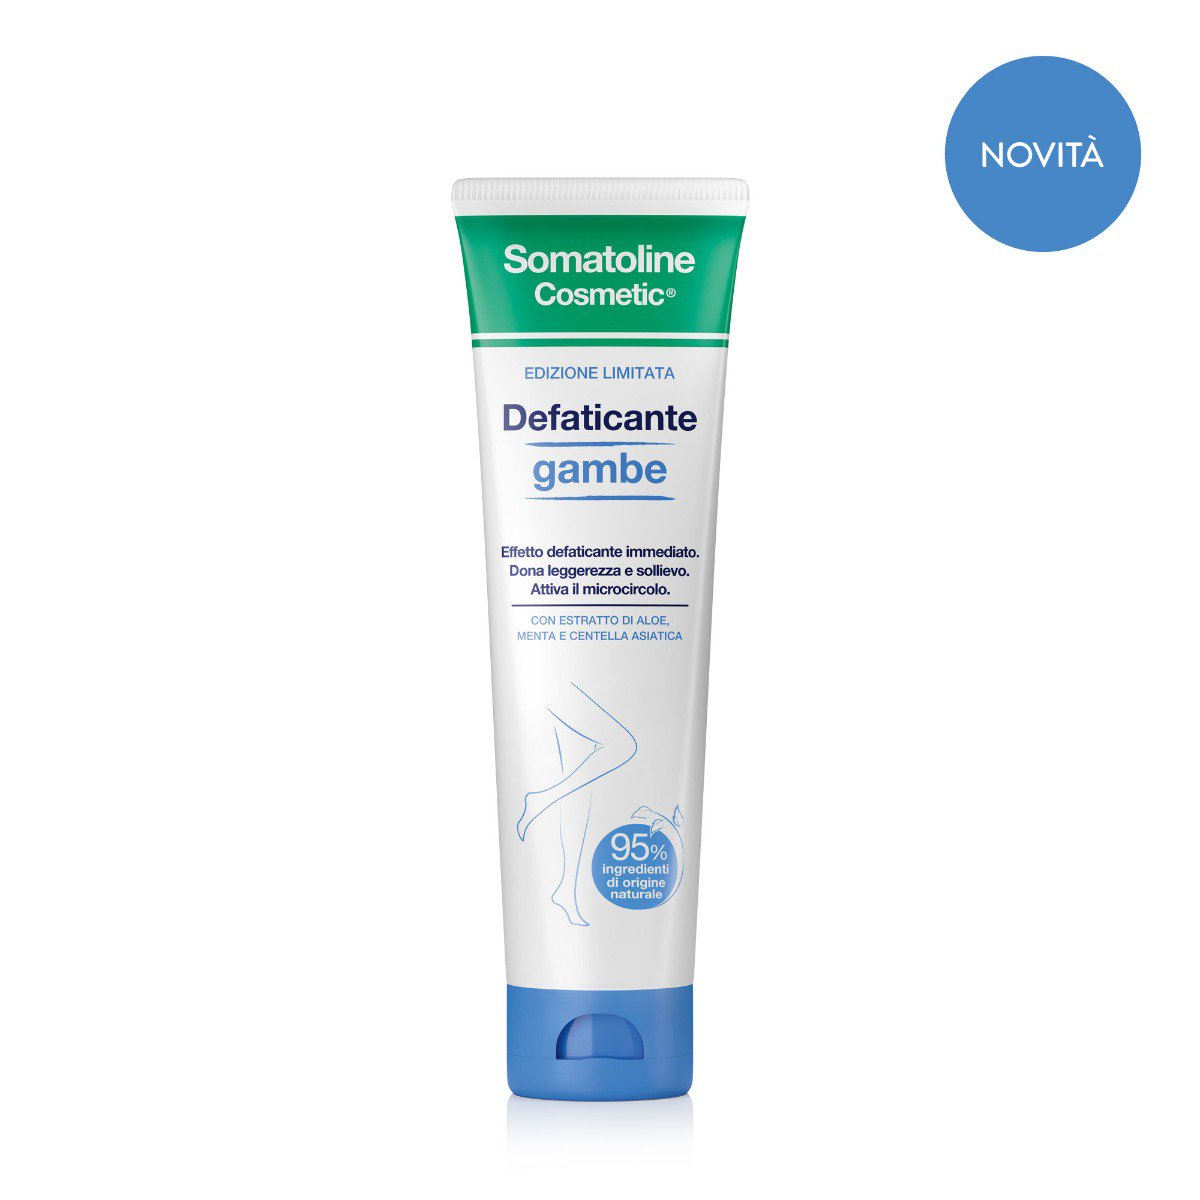 Somatoline Cosmetic Defatigante Gambe 100ml - Arcafarma.it